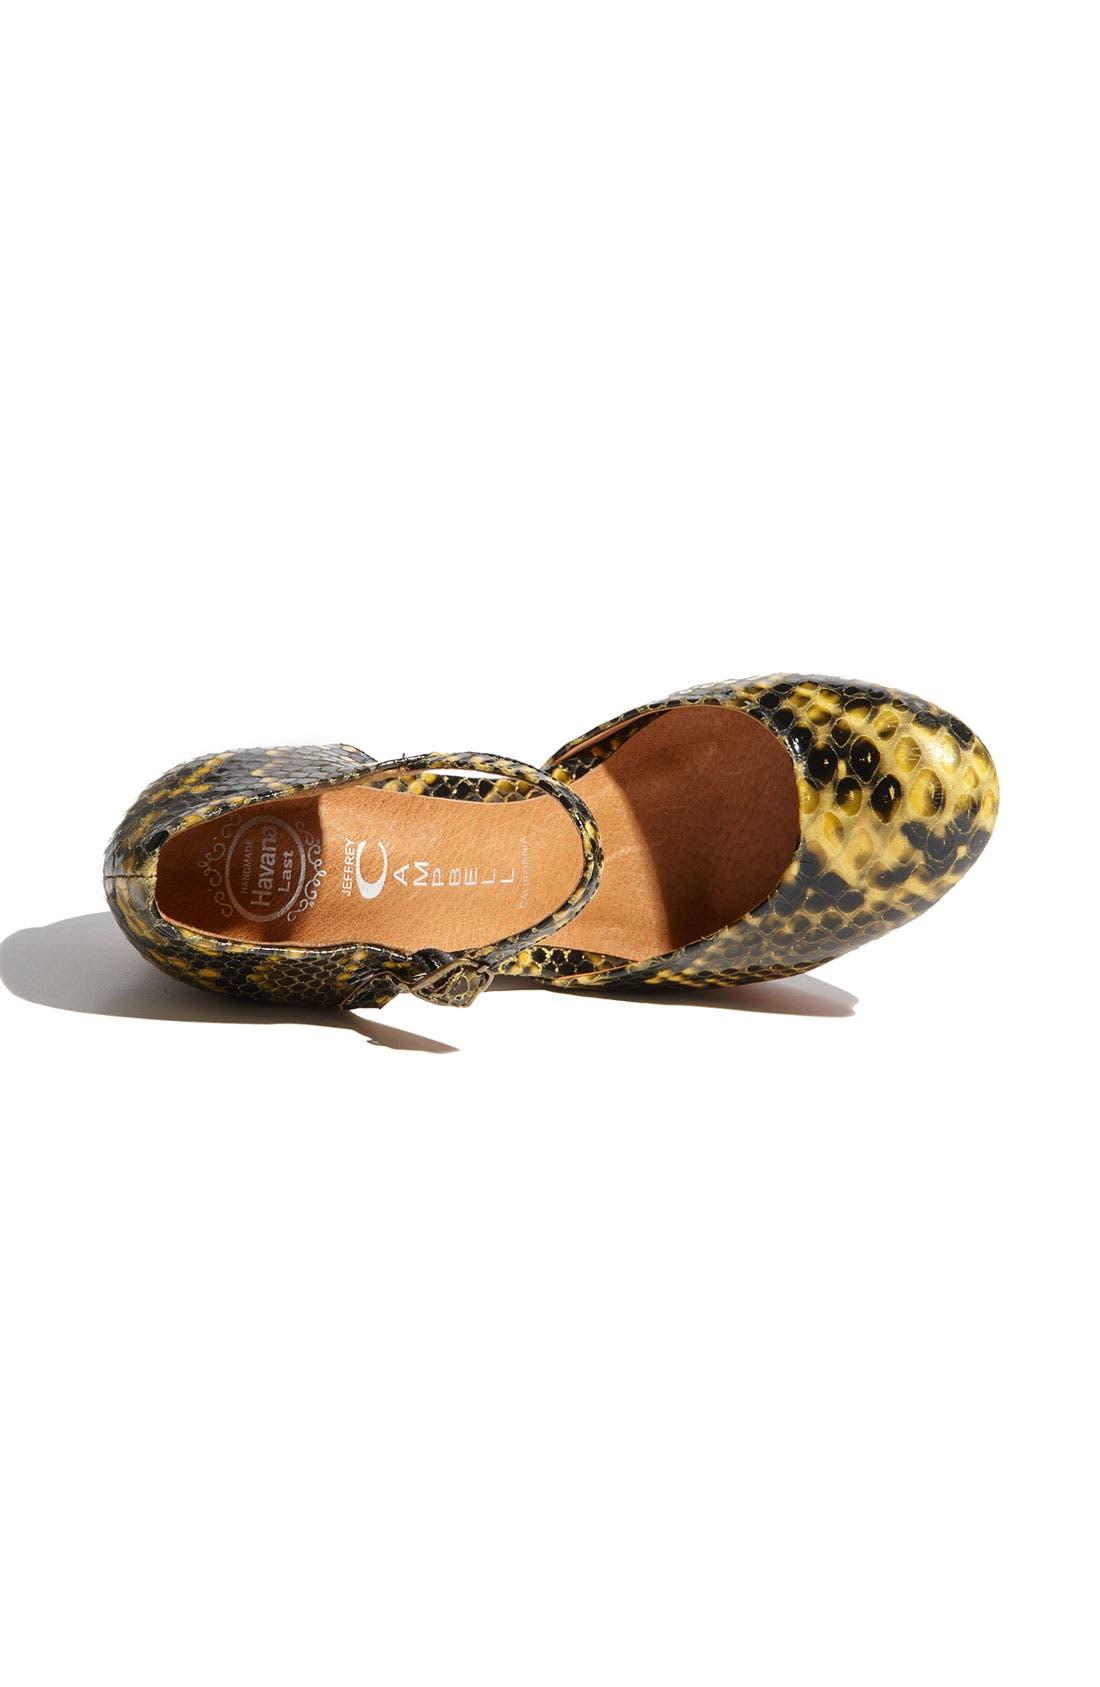 Alternate Image 3  - Jeffrey Campbell 'Rock Play' Sandal